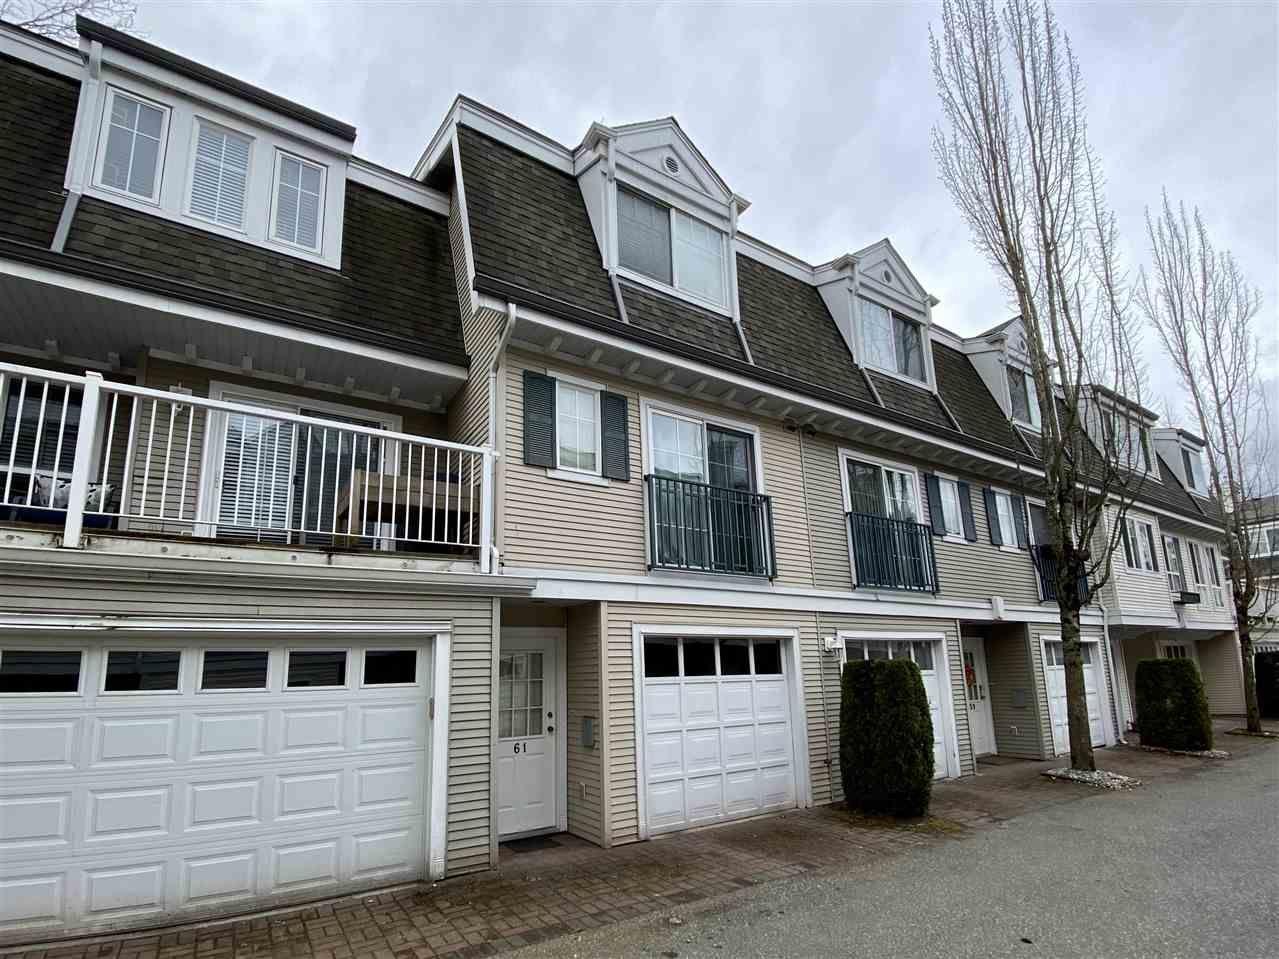 "Main Photo: 61 8930 WALNUT GROVE Drive in Langley: Walnut Grove Townhouse for sale in ""Highland Ridge"" : MLS®# R2554436"